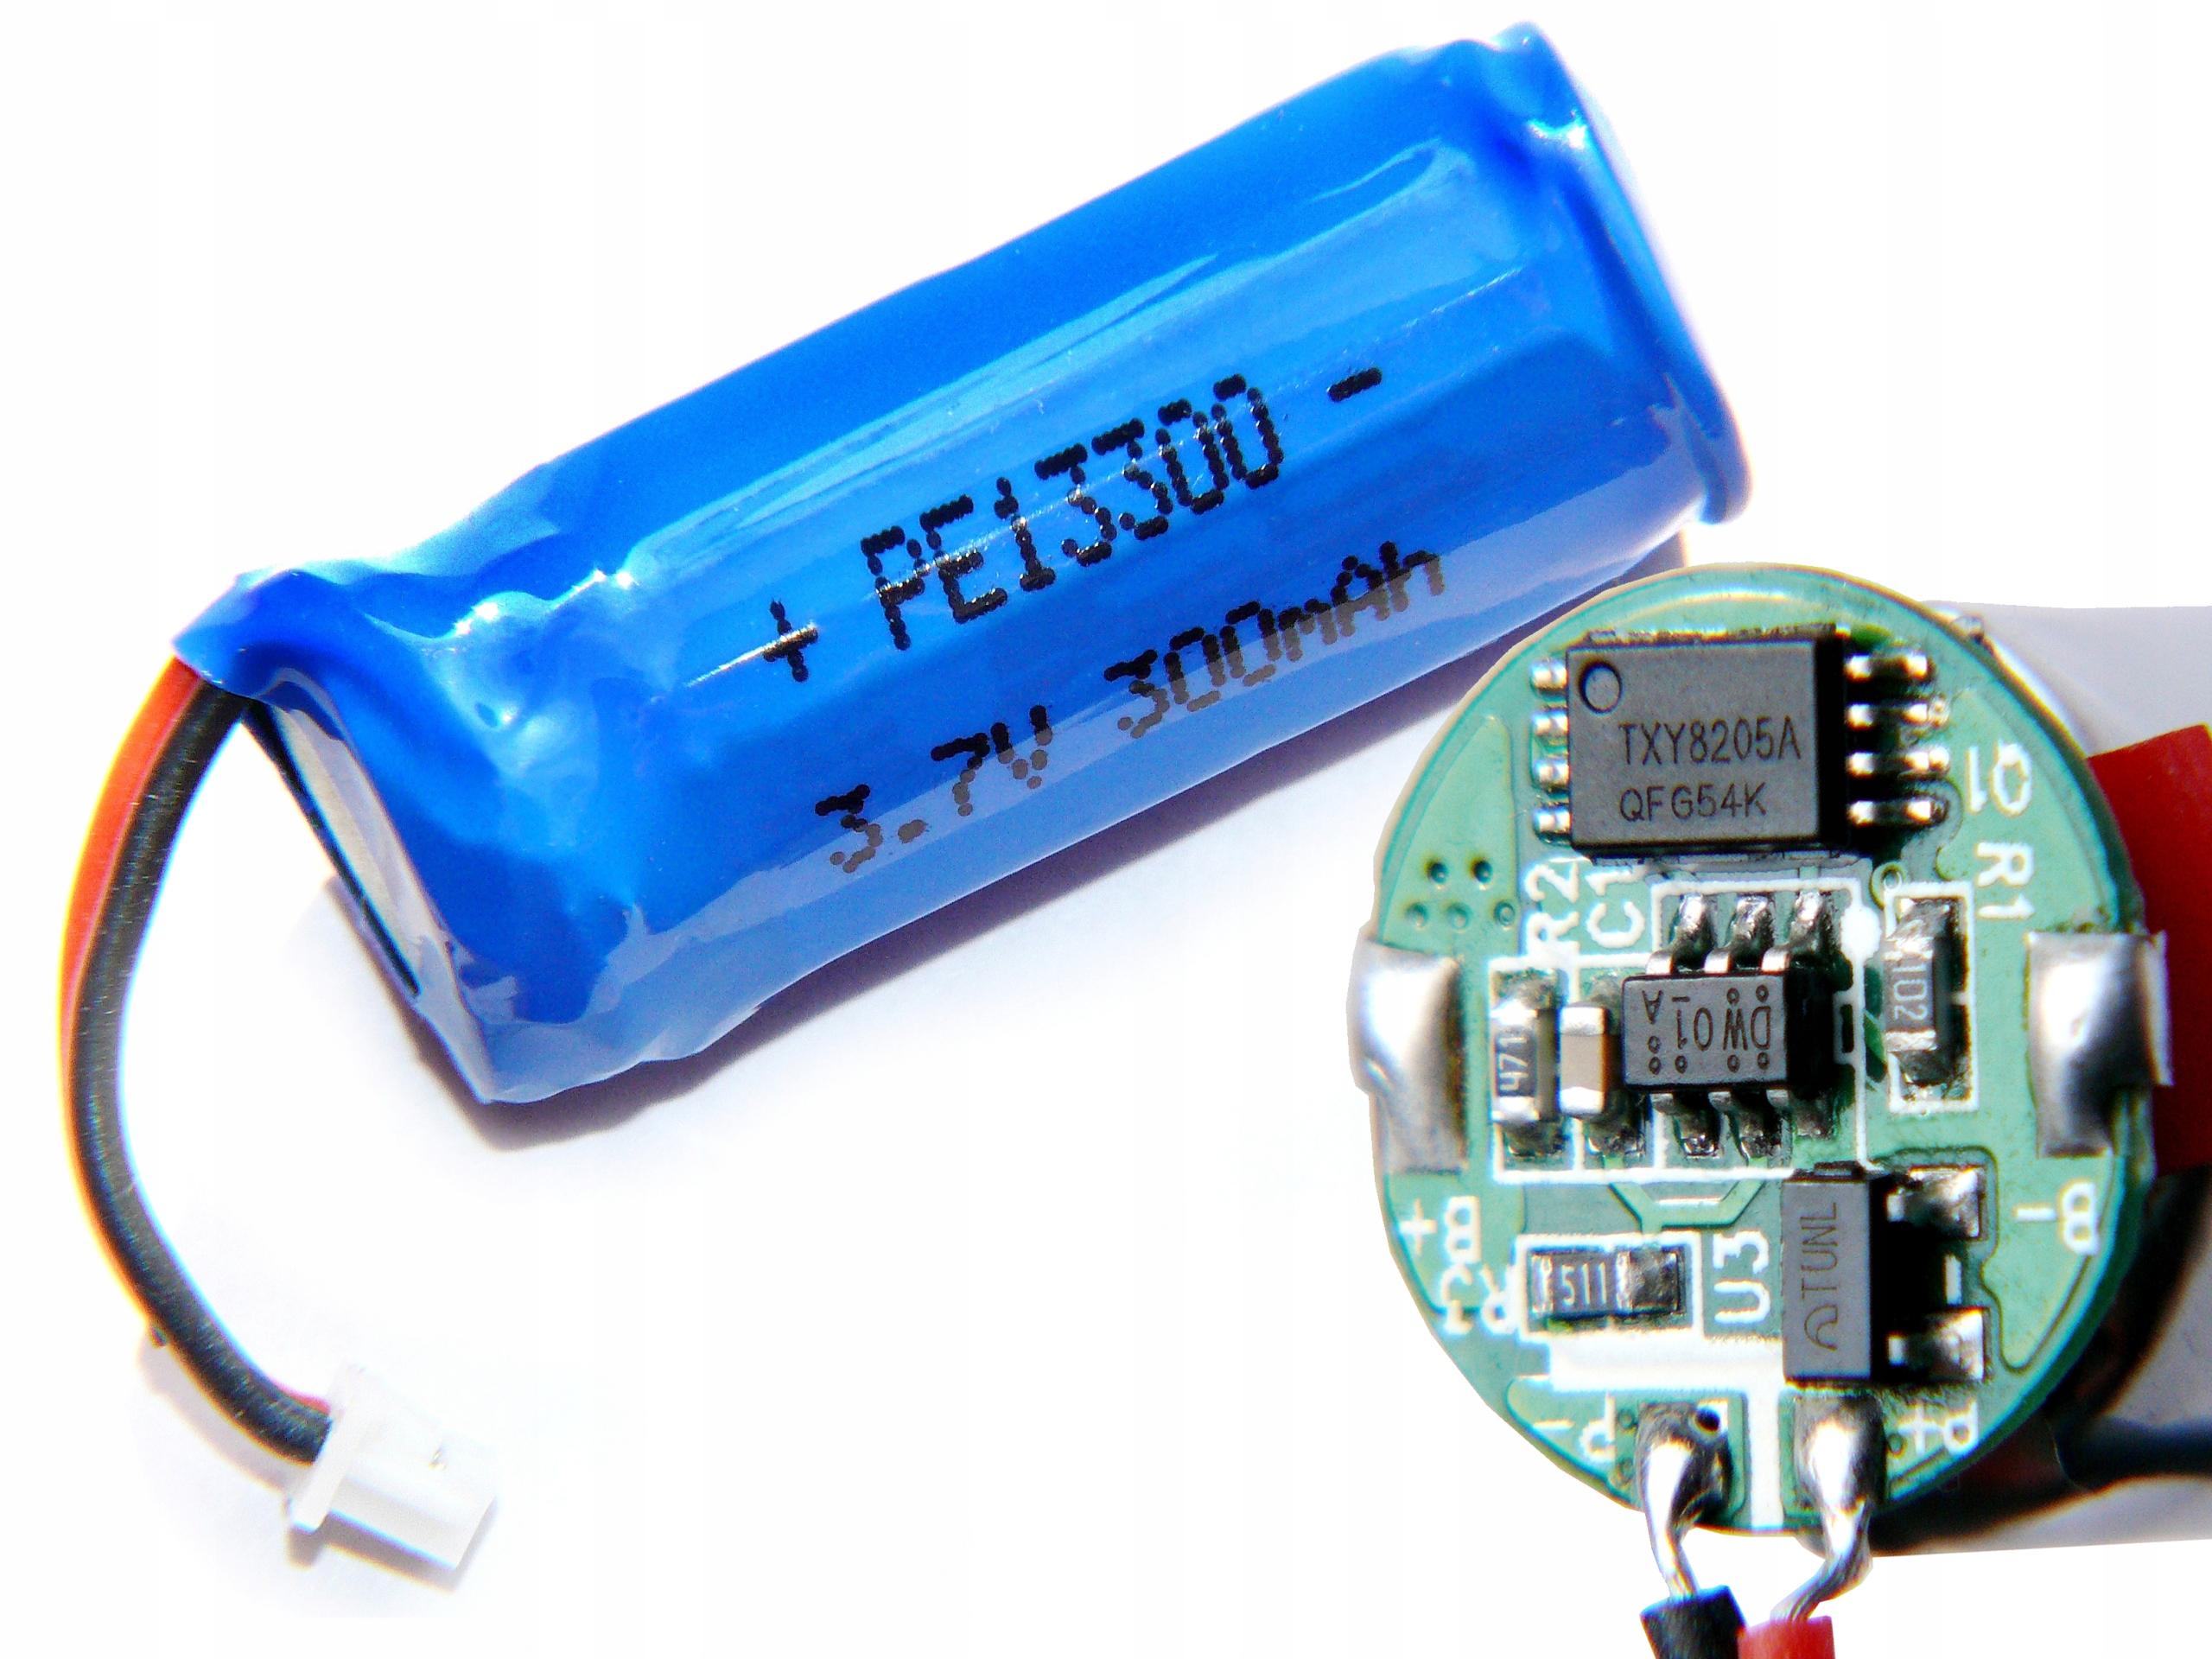 Item Battery Li-Pol 3.7 V 300mAh electronic protection